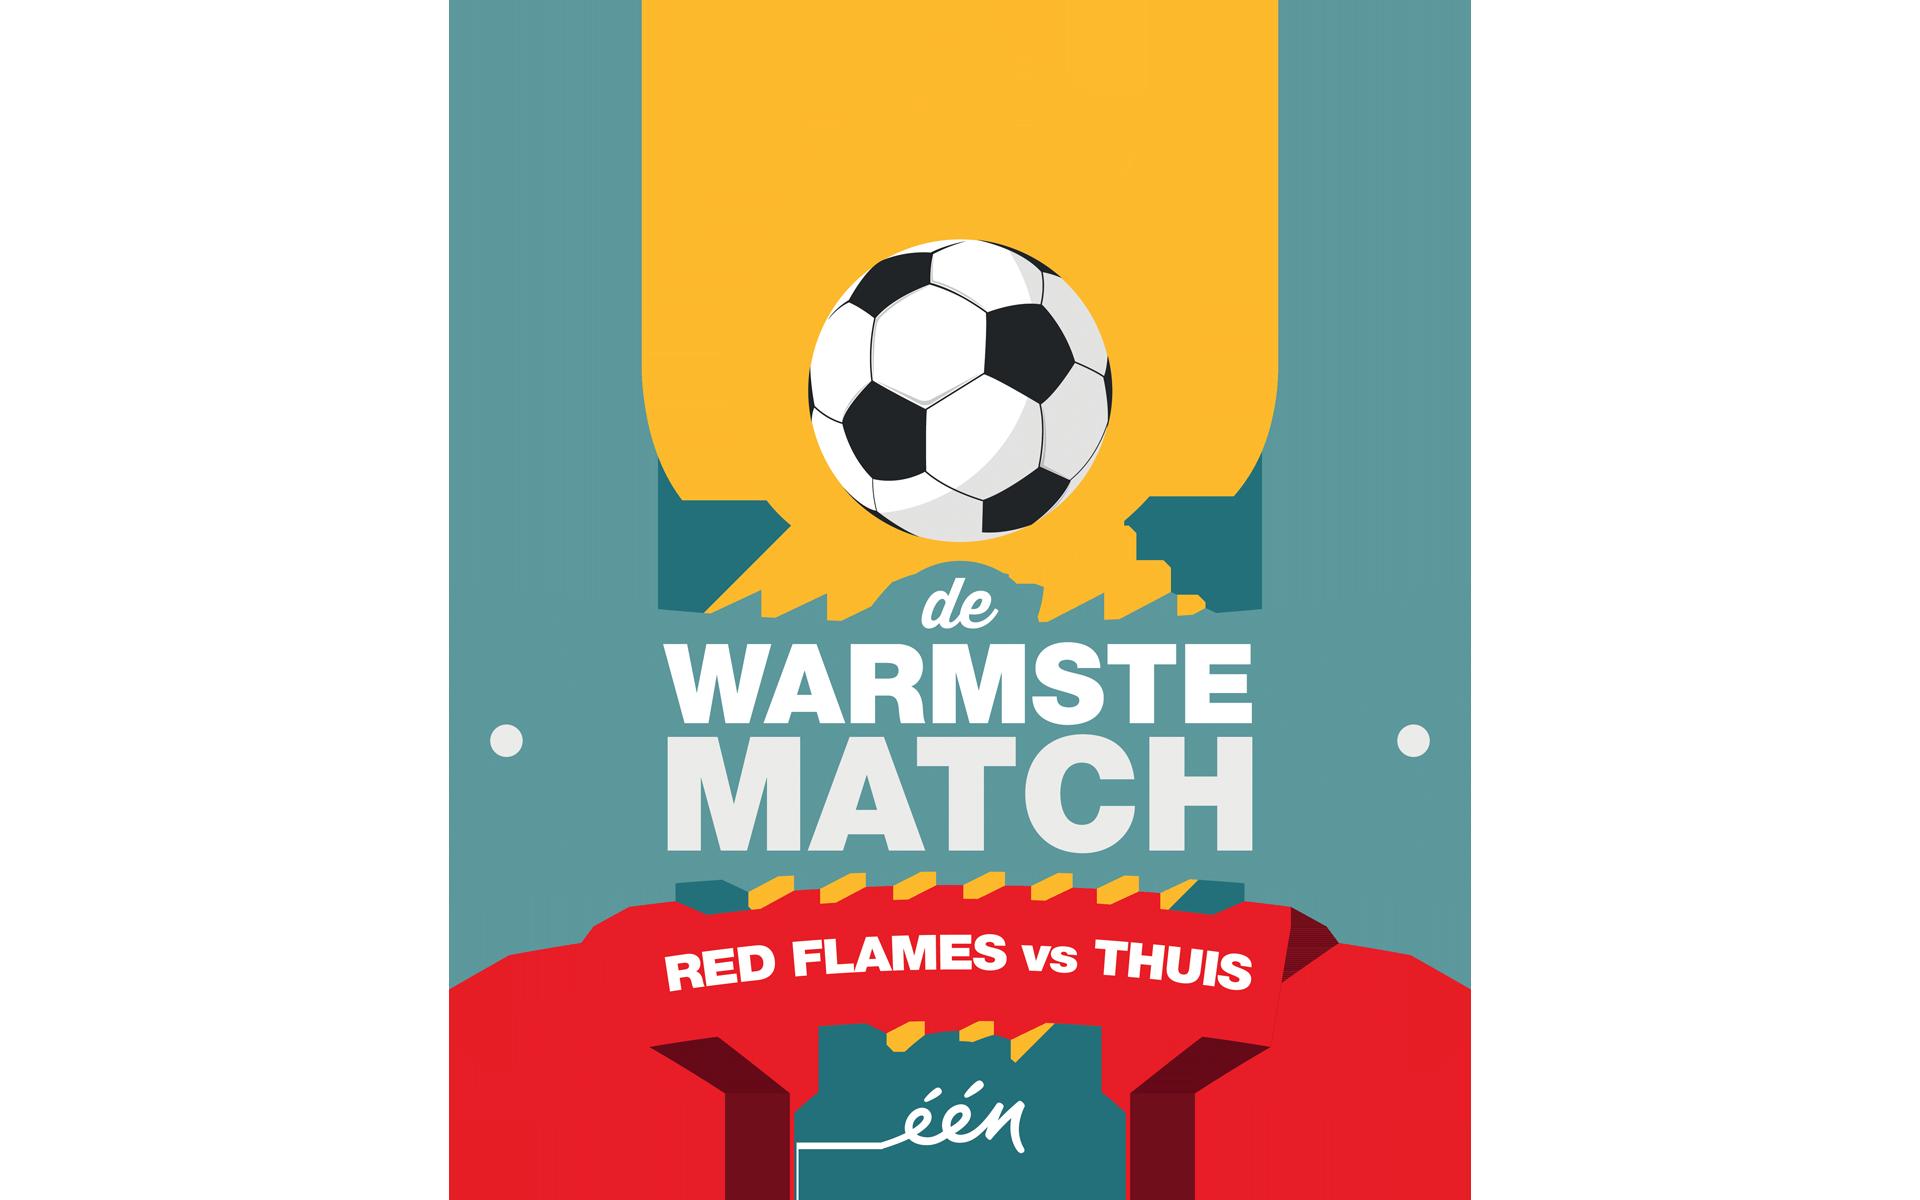 De warmste match